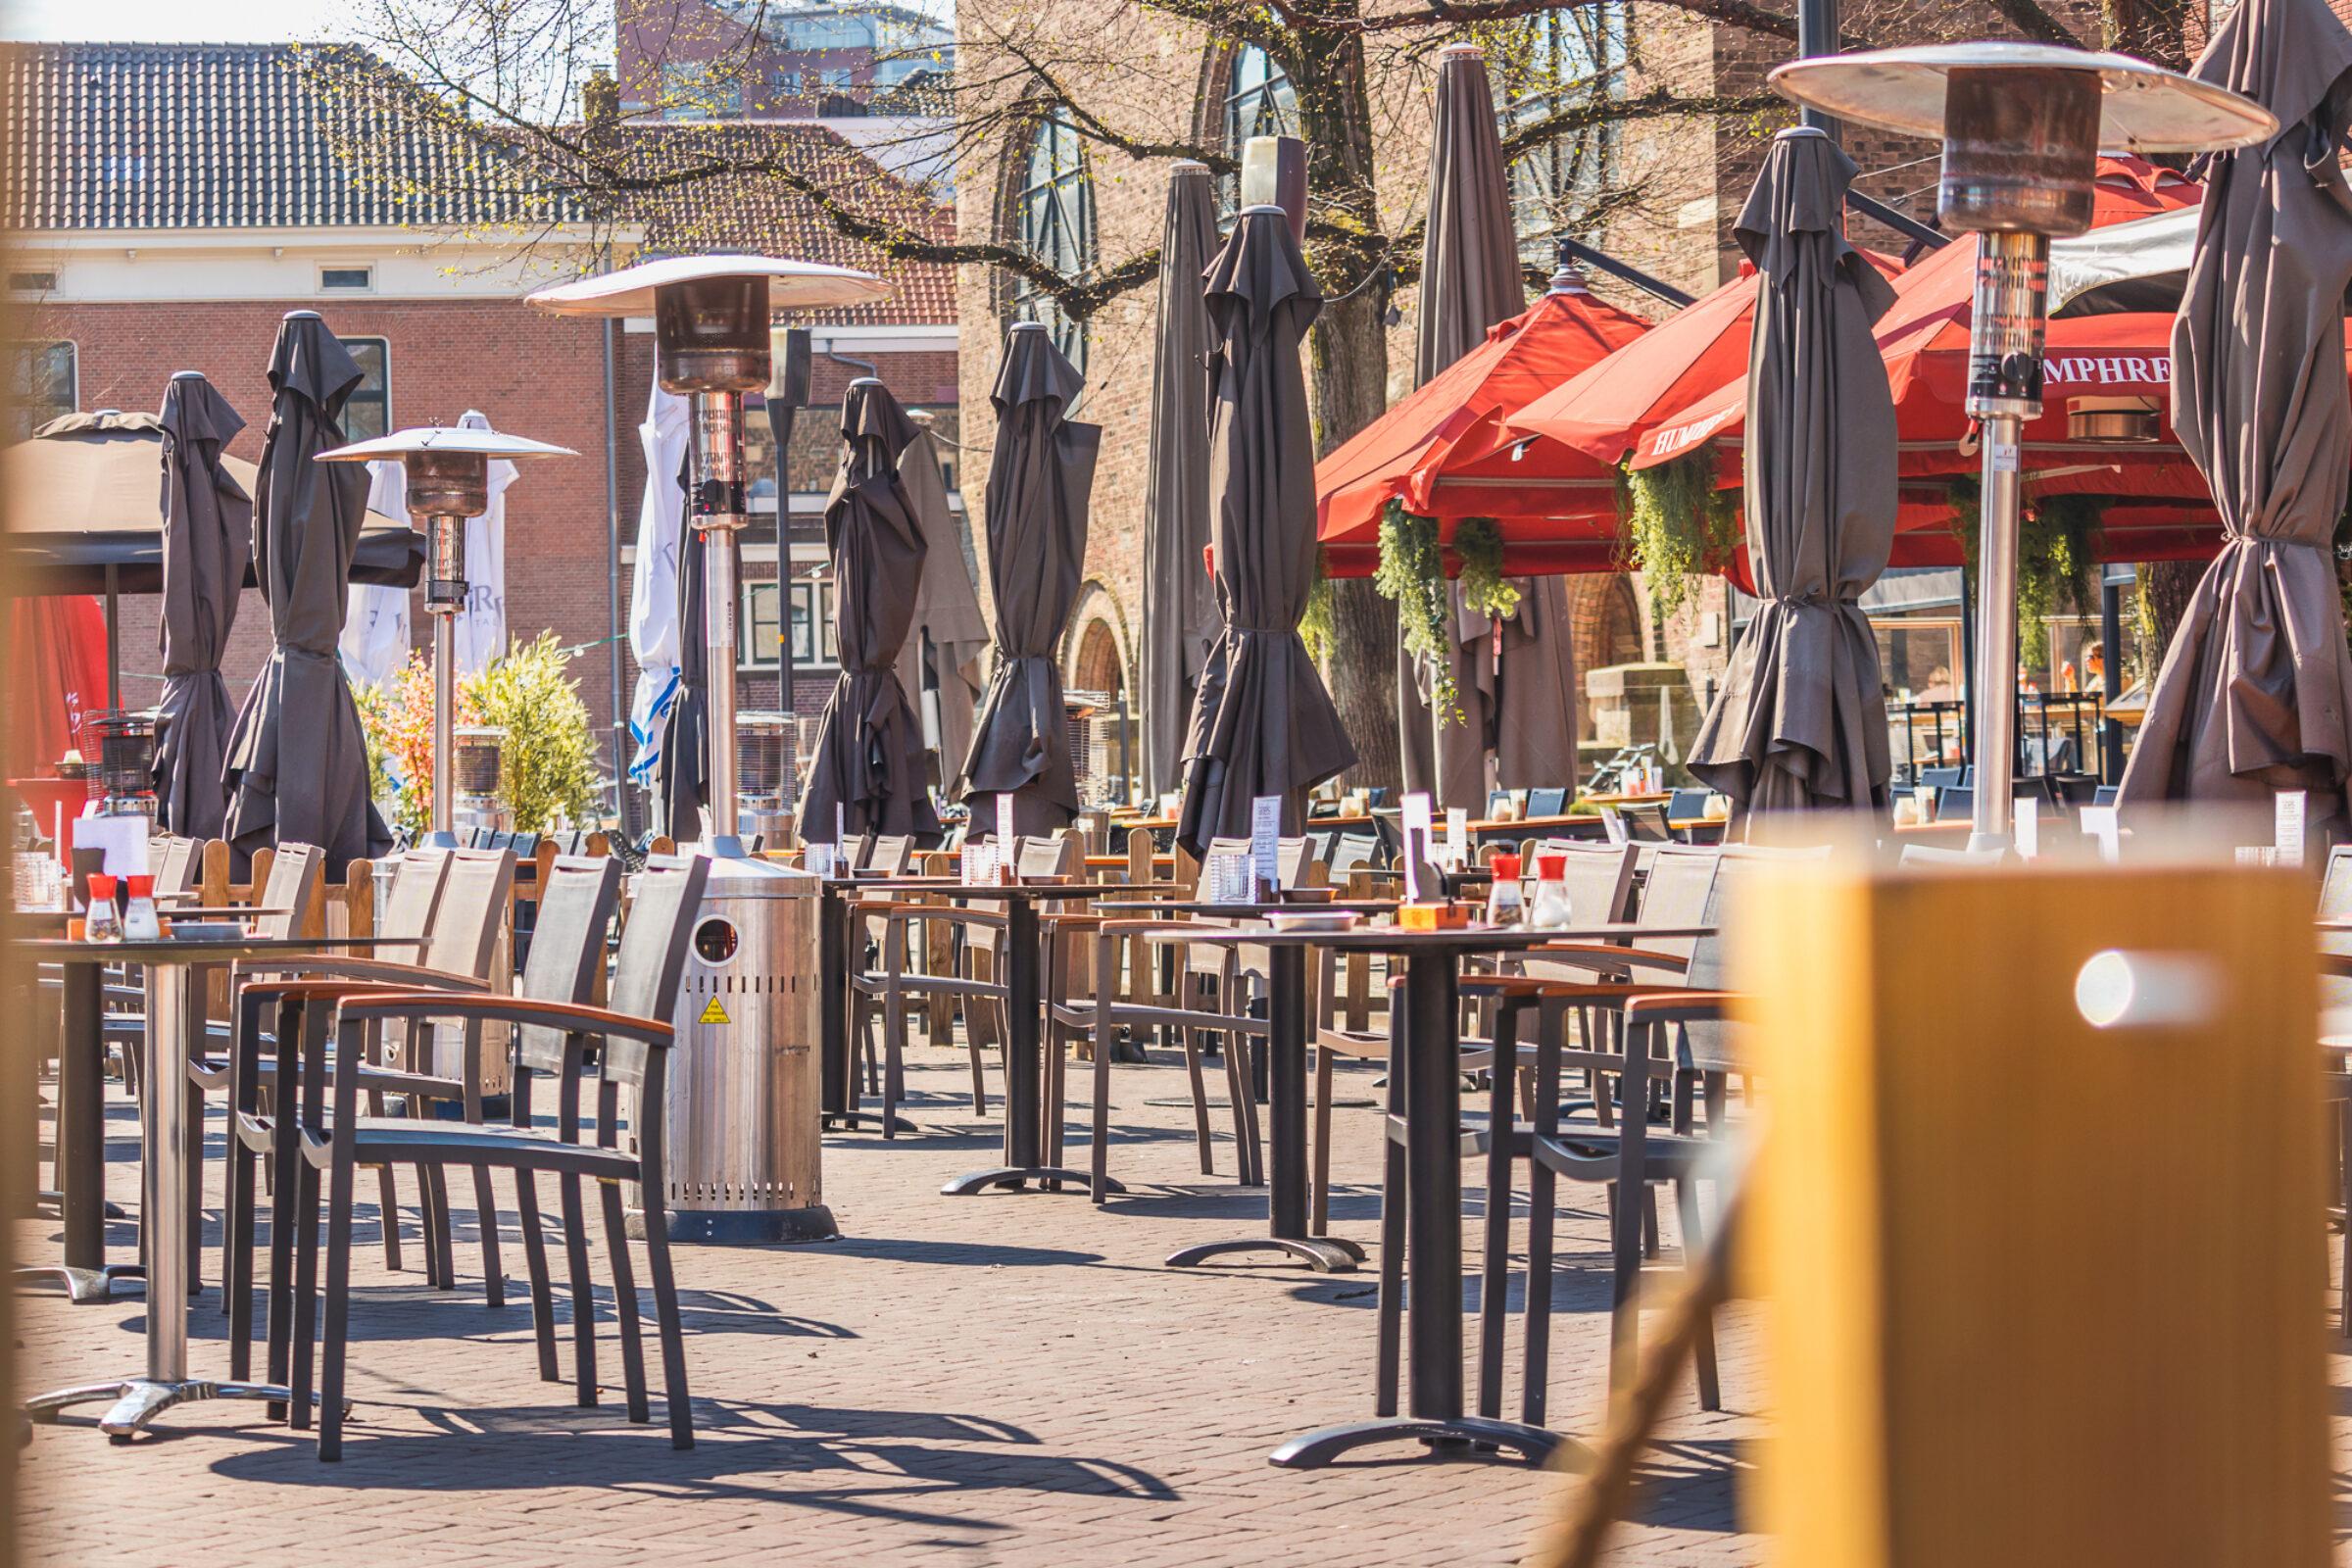 Terrassen-Oude-Markt-2-Enschede